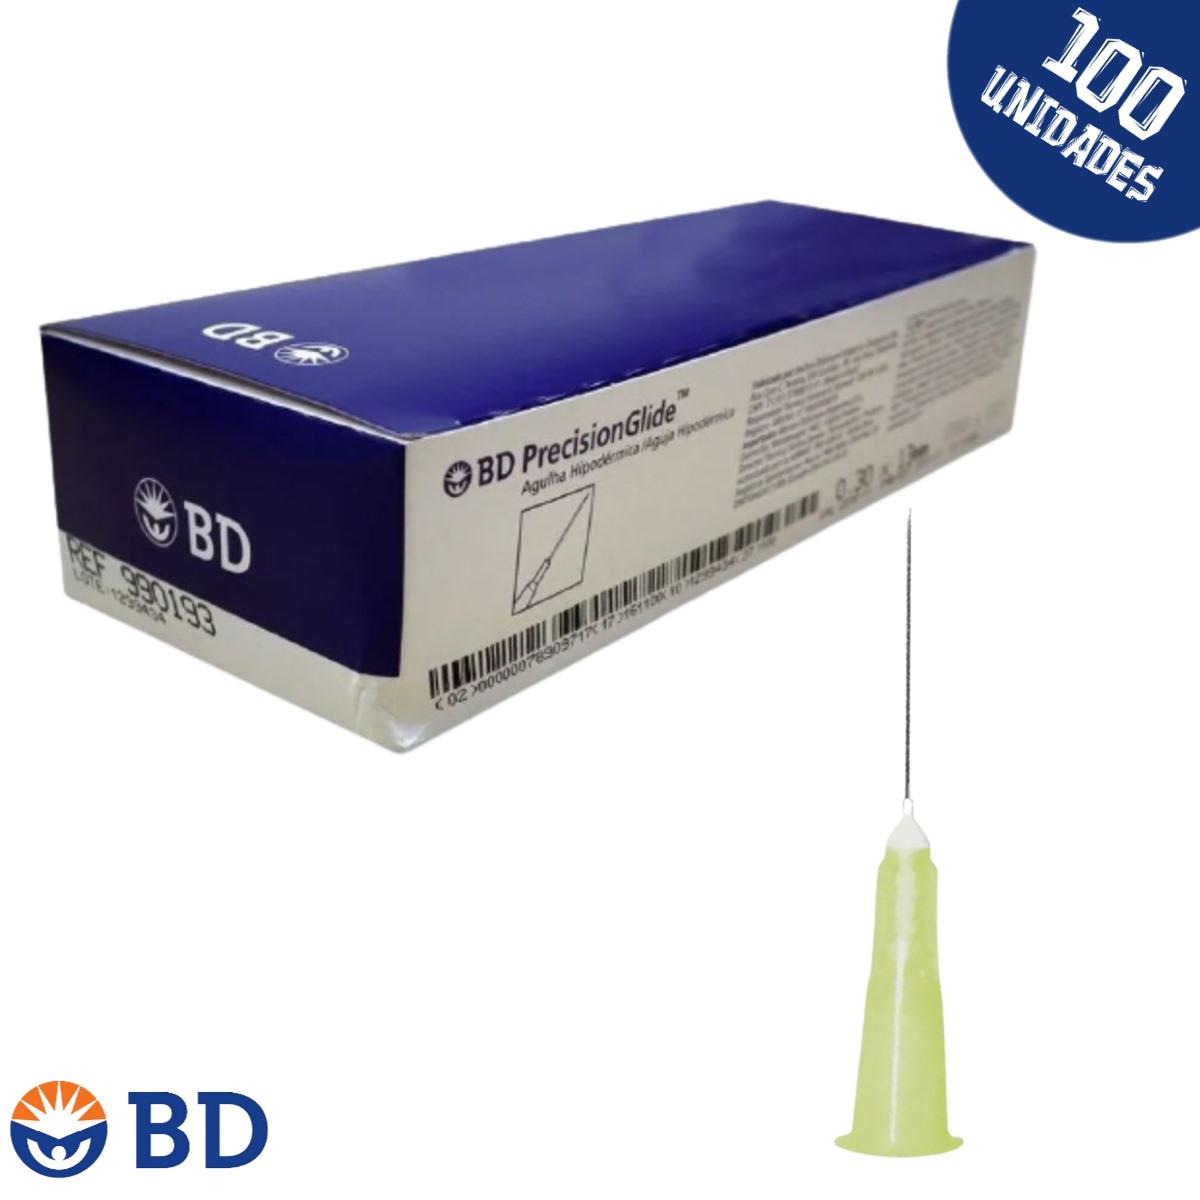 Agulha HiPodérmica Carboxiterapia 13x3 30g 1/2 - BD - 100un